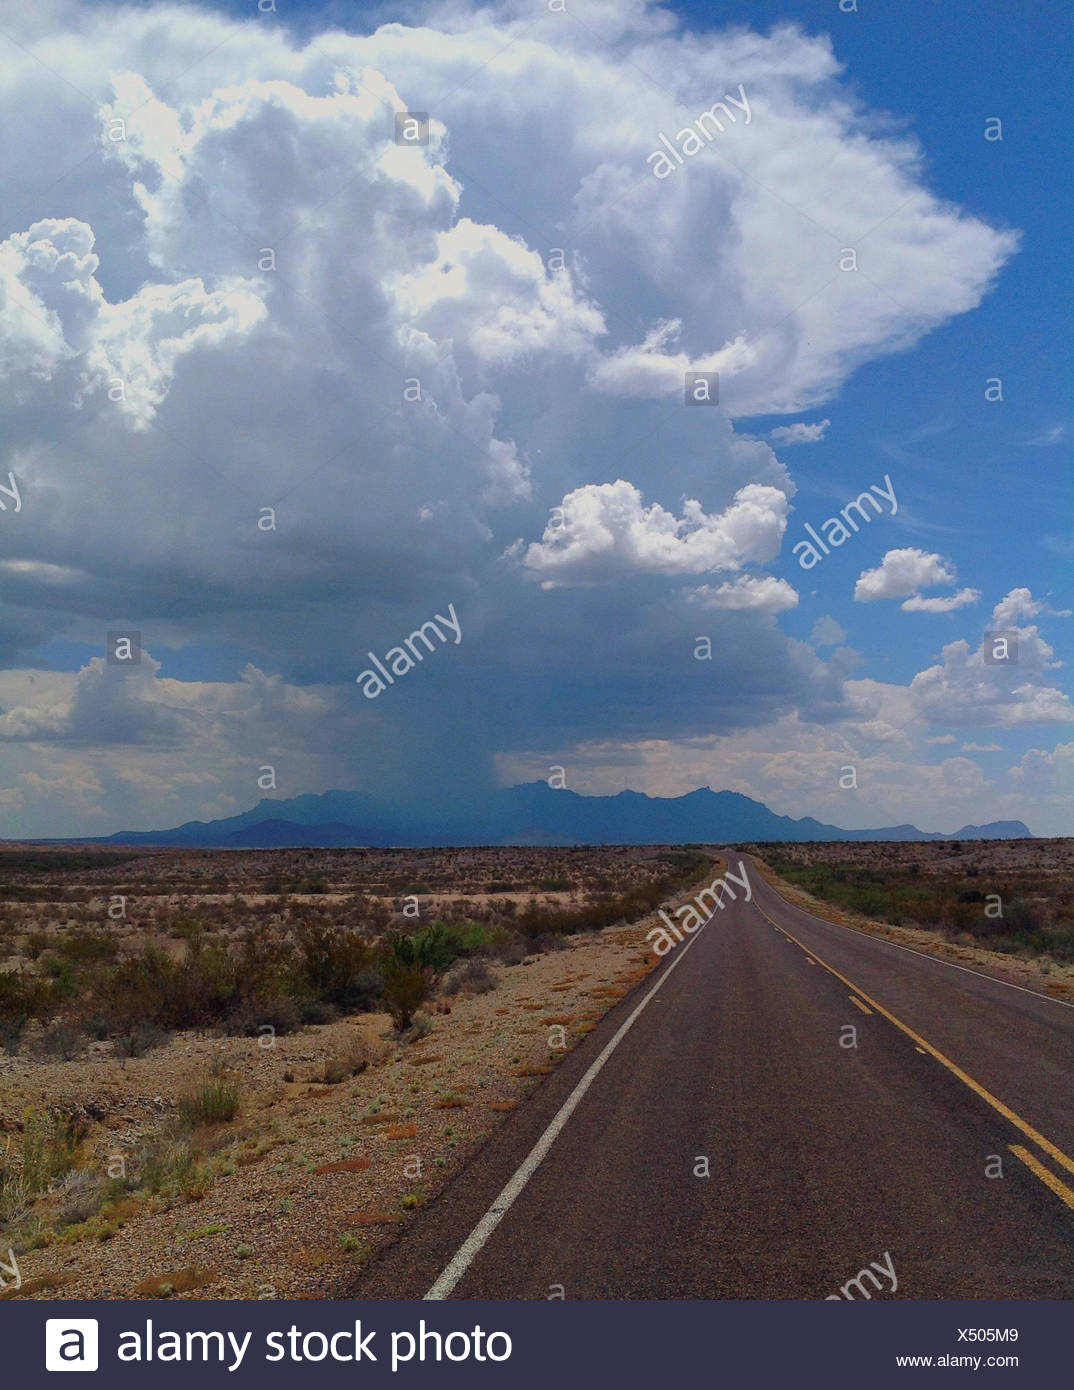 USA, Texas, Brewster County, Big Bend National Park, Desert highway - Stock Image